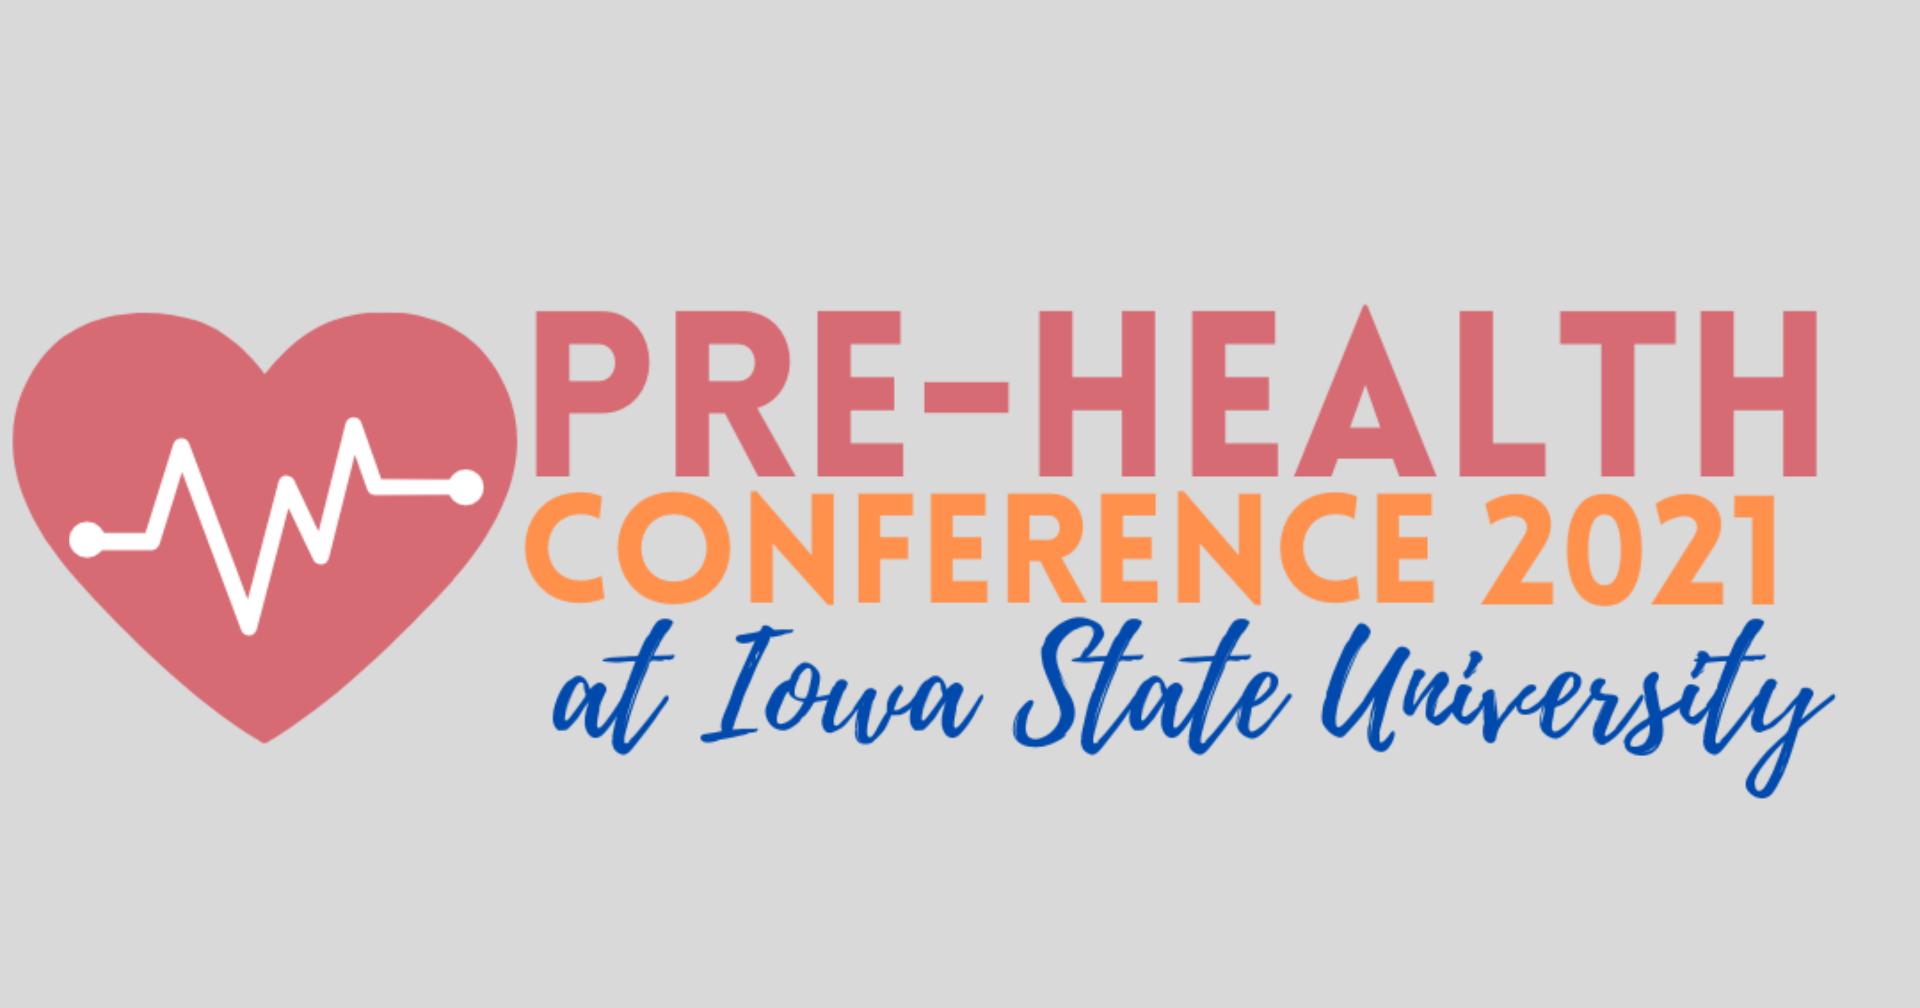 Pre-Health Conference at Iowa State